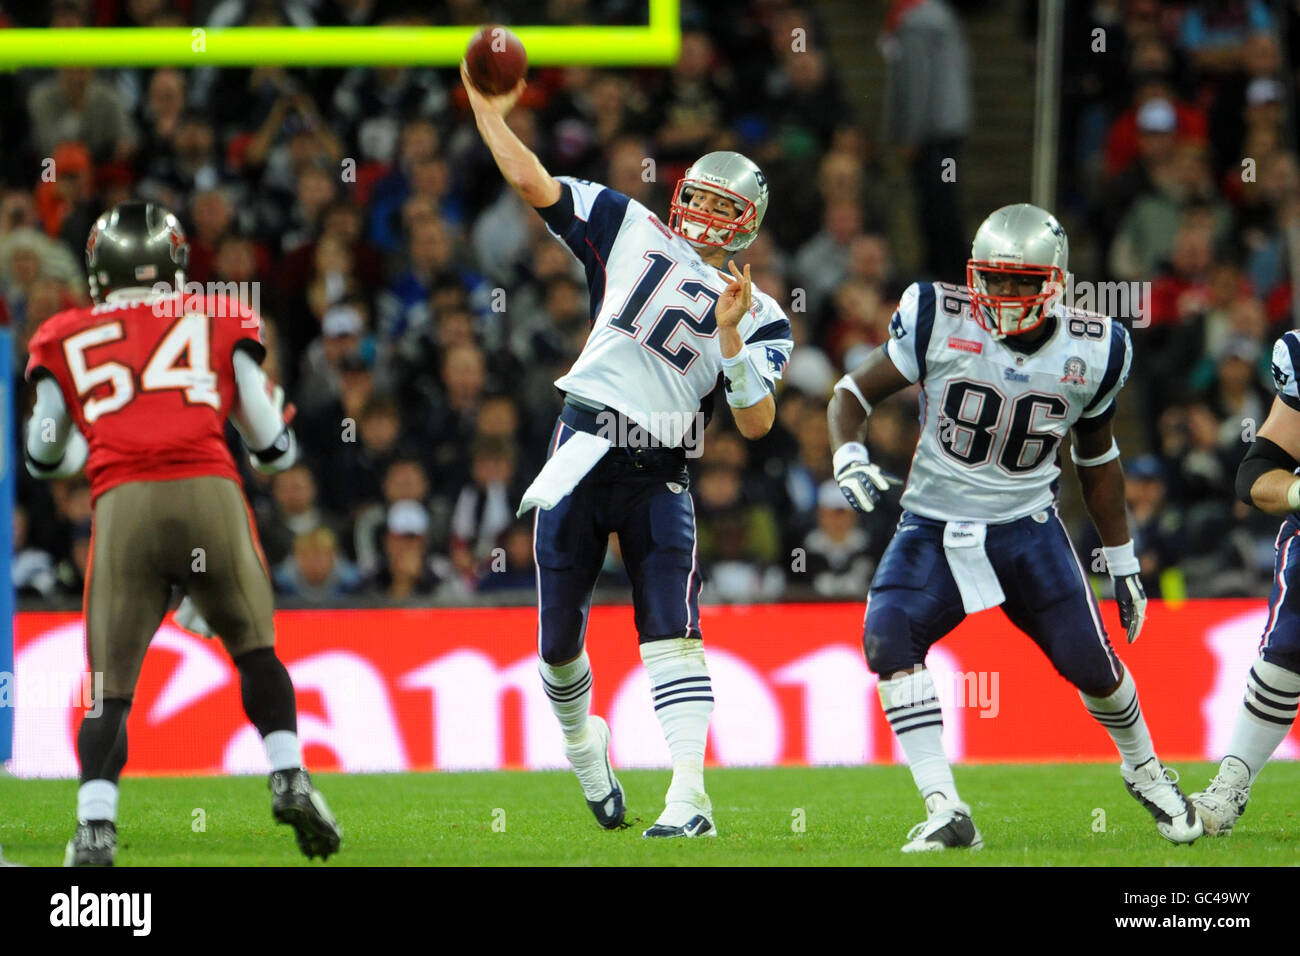 Fútbol americano - NFL - New England Patriots v Tampa Bay Buccaneers - Wembley Stadium Imagen De Stock